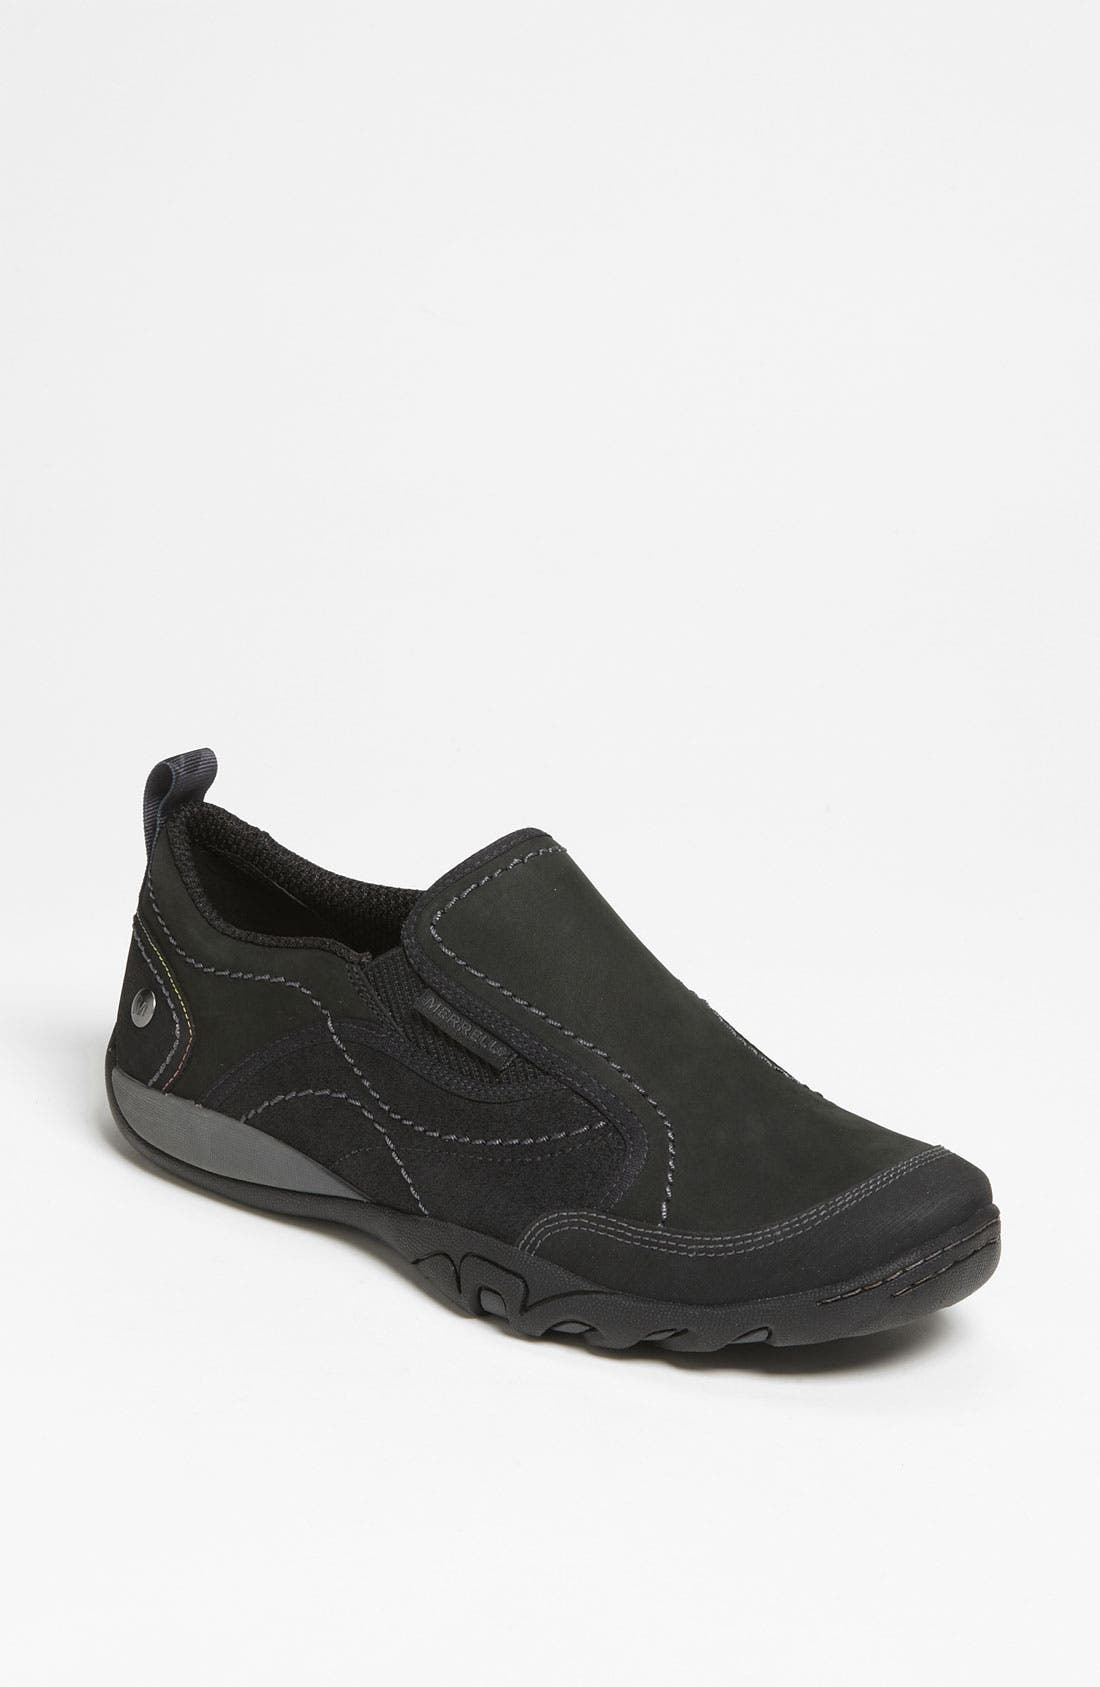 Main Image - Merrell 'Mimosa Moc' Sneaker (Women)